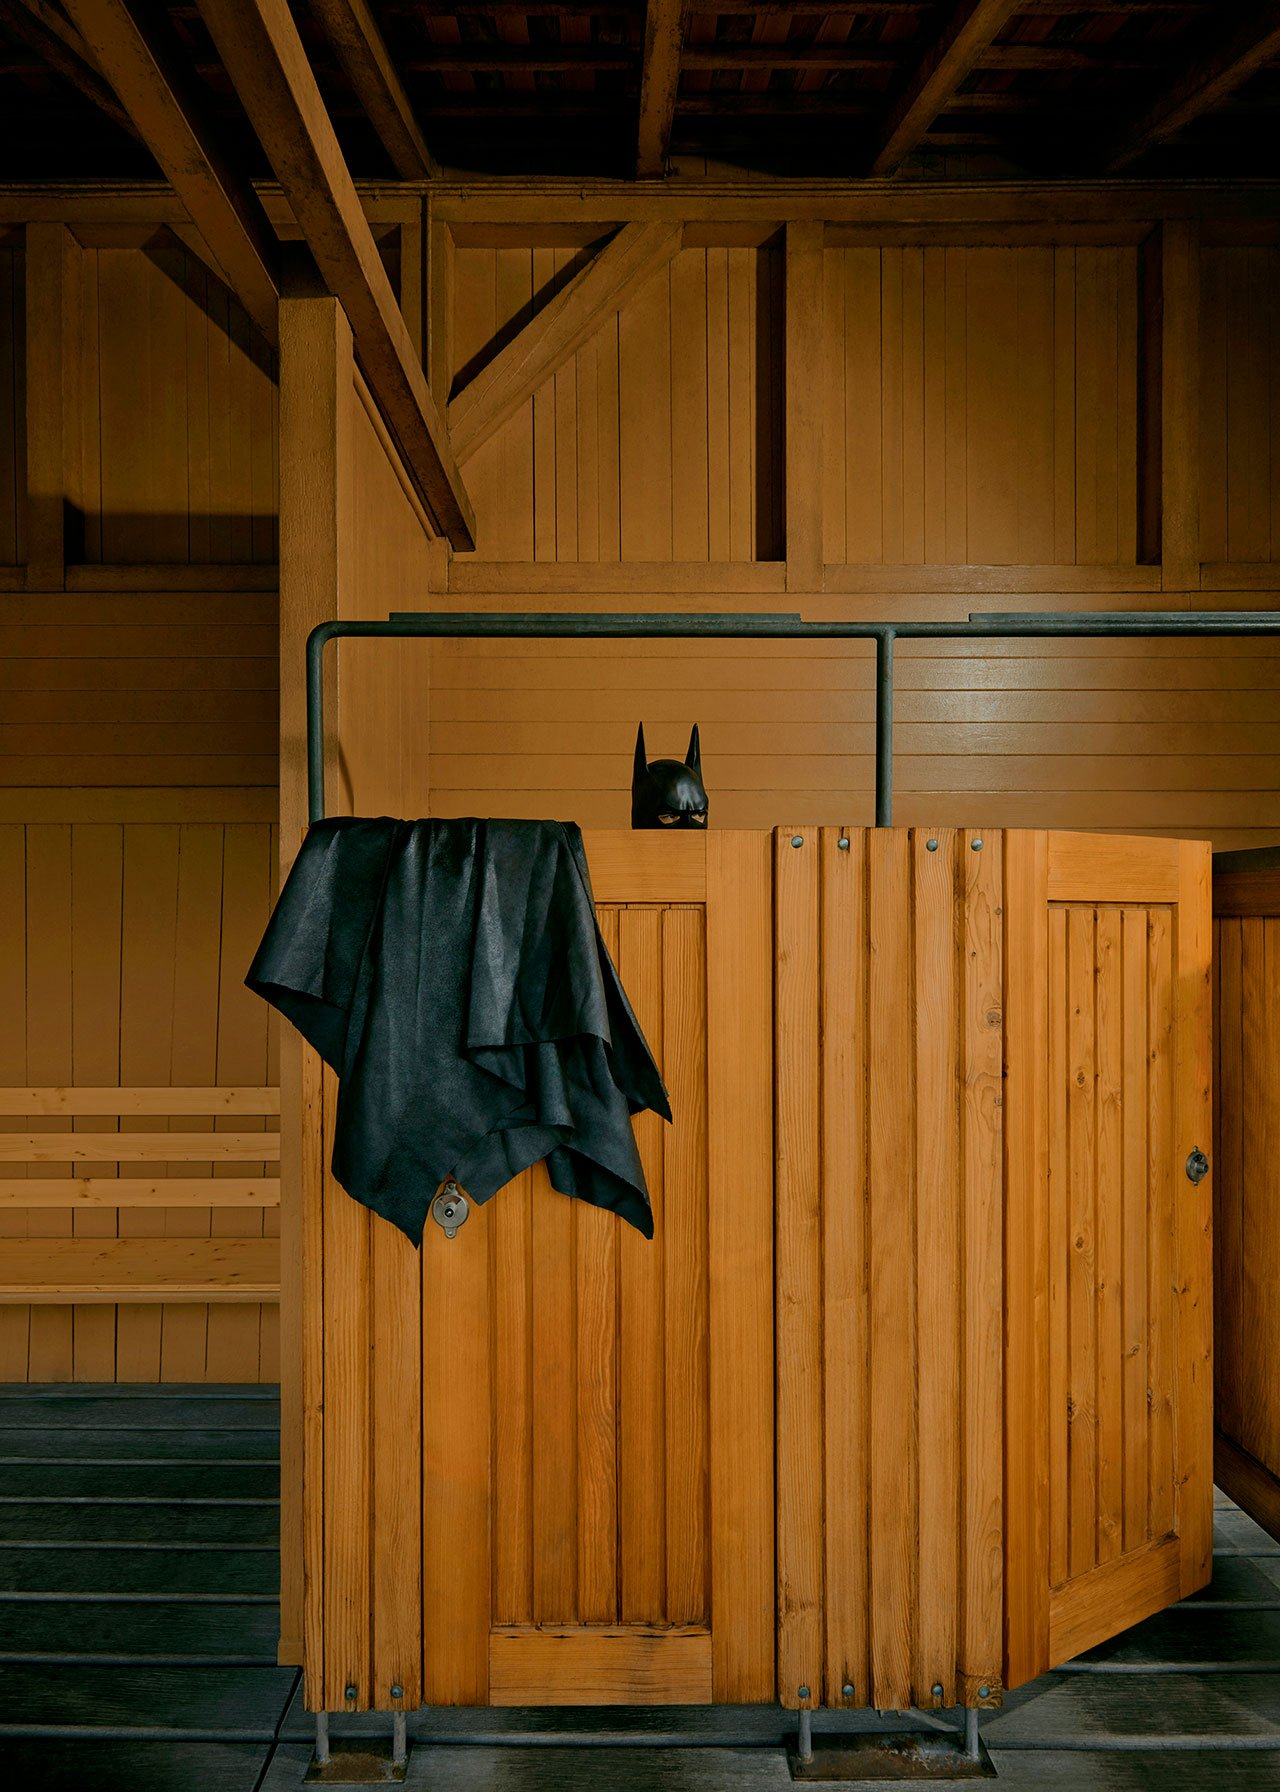 Daily Bat - Summertime. Photography by Sebastian Magnani.